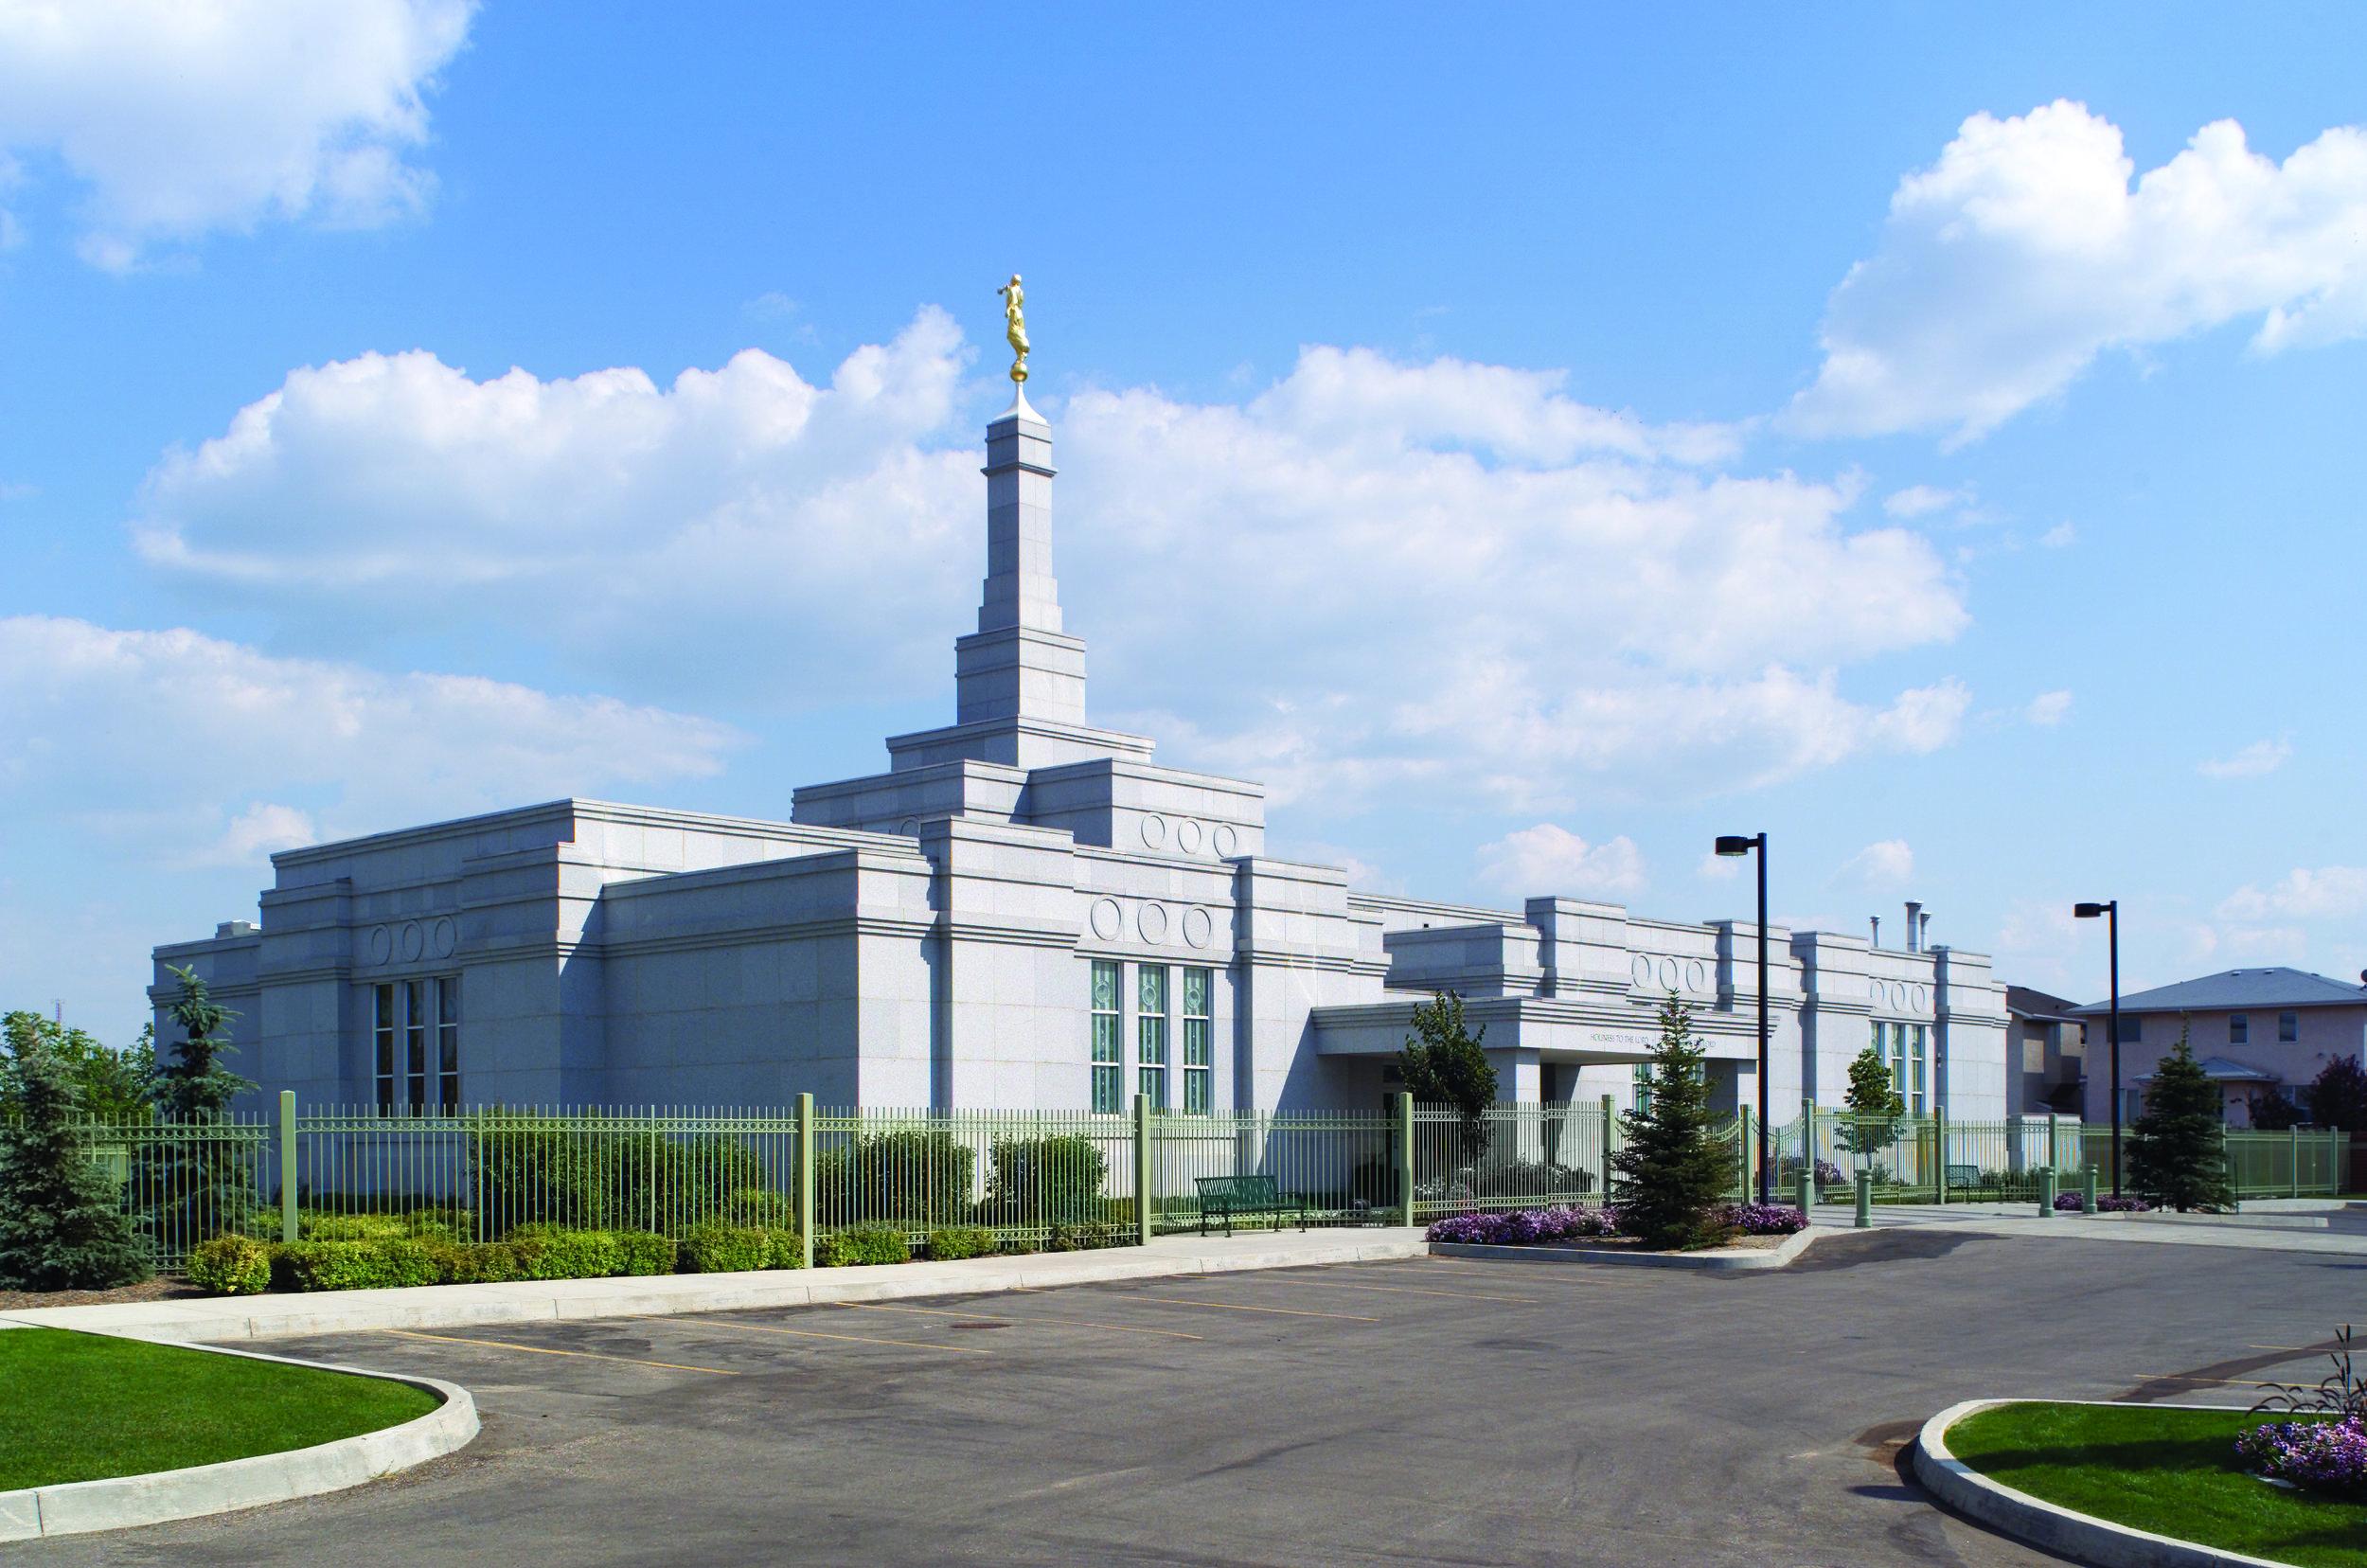 Latter Day Saints Temple - Regina, SK